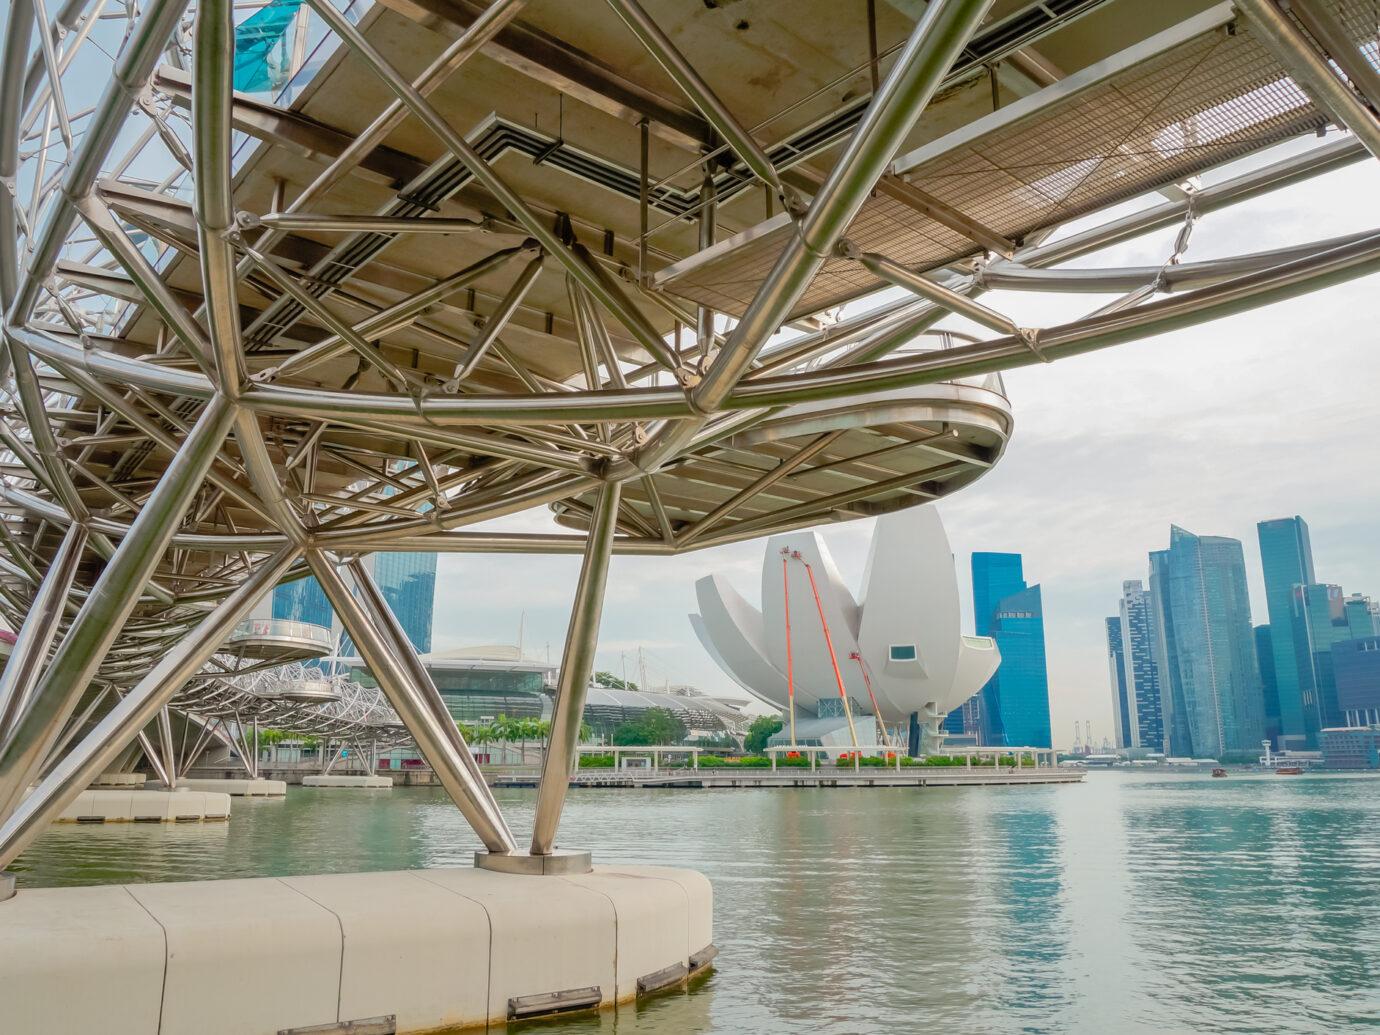 helix bridge at marina bay, singapore